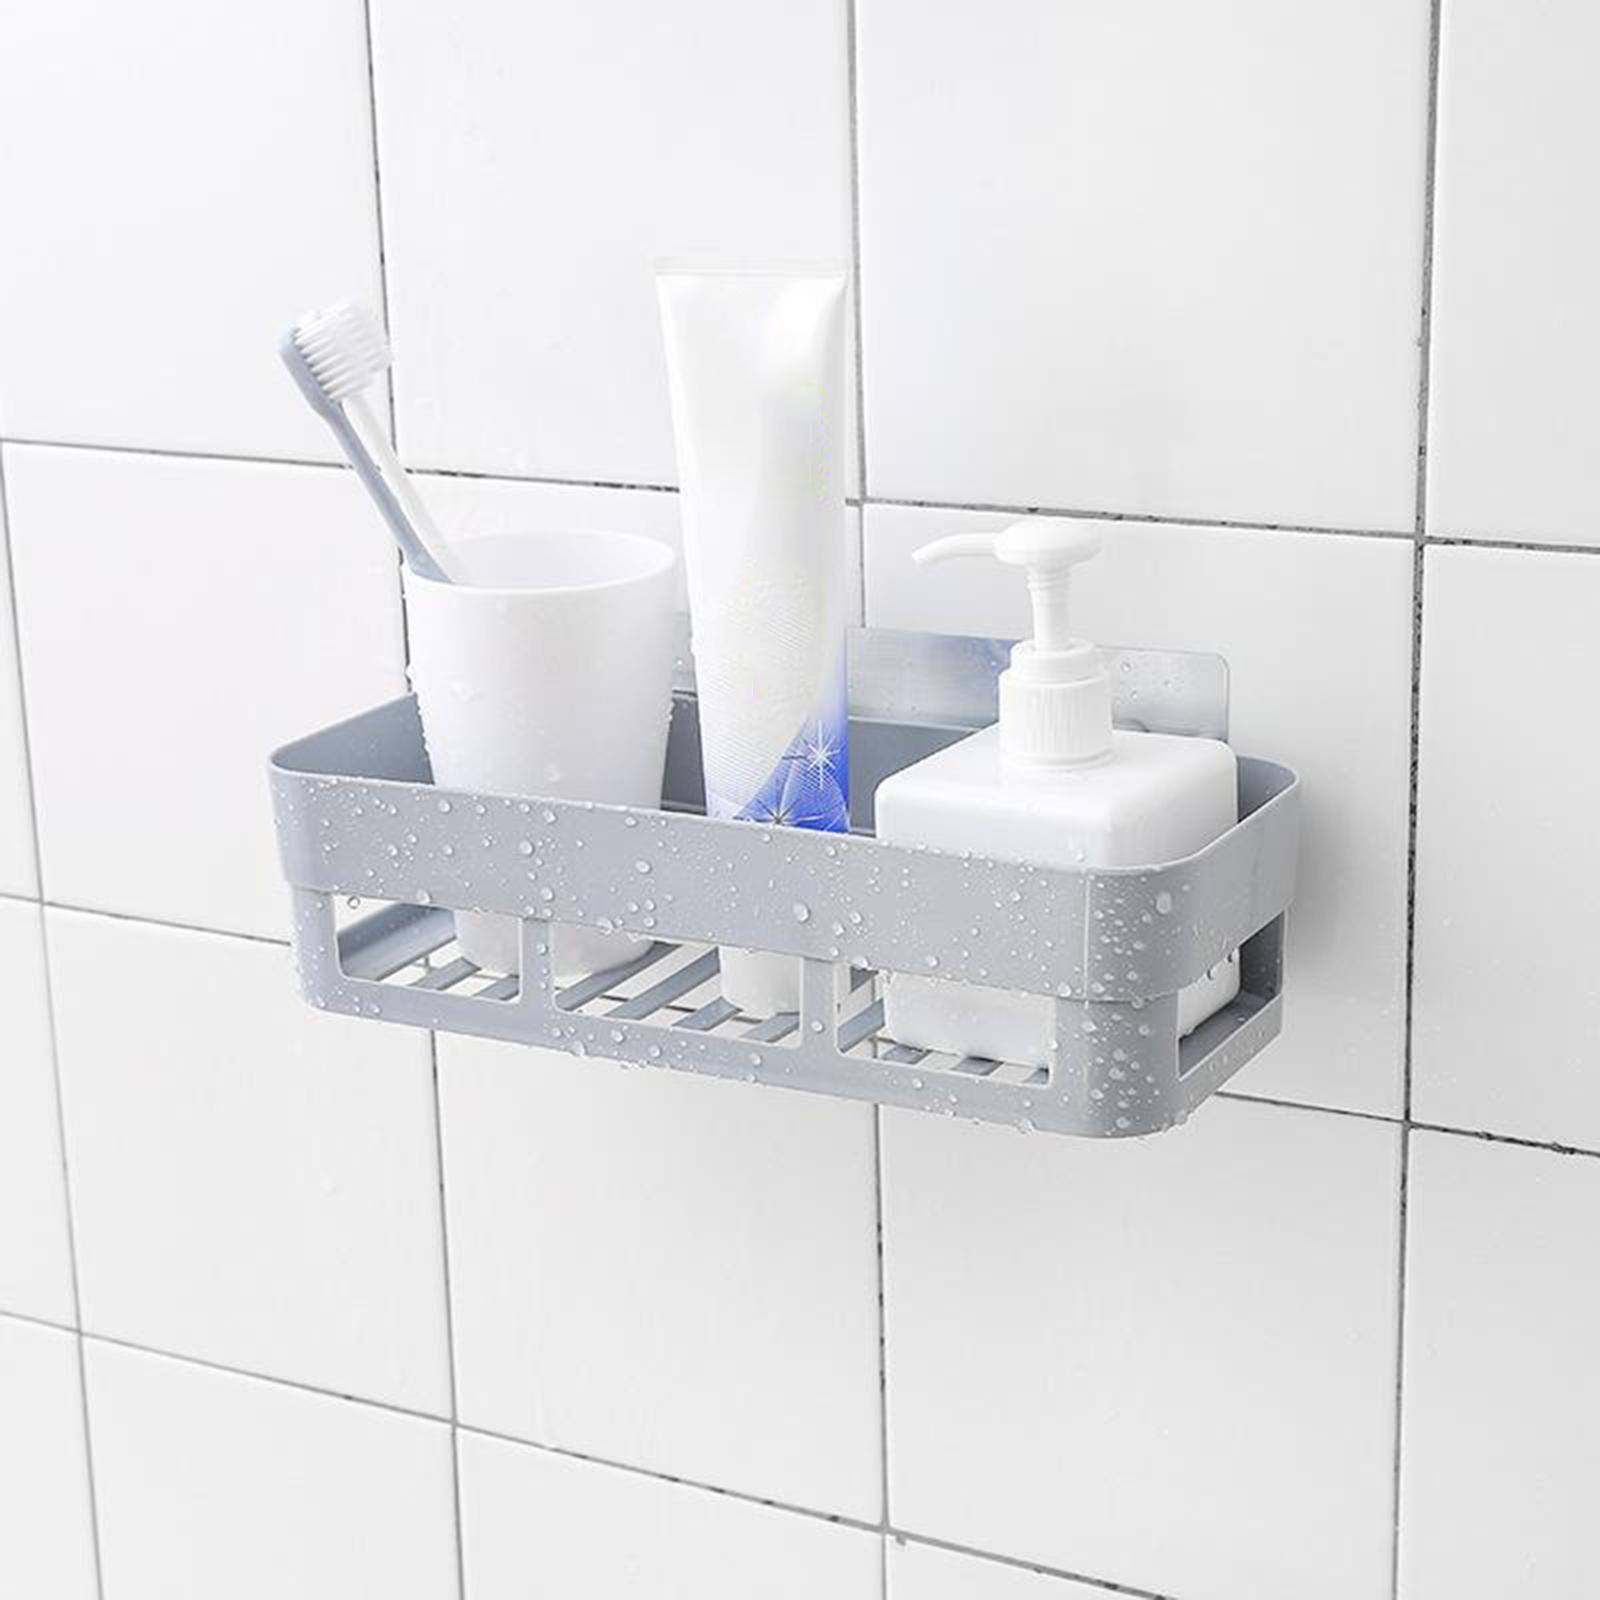 thumbnail 8 - Wall-Suction-Bathroom-Shelf-Shower-Caddy-Wall-Mount-Storage-Rack-Organizer